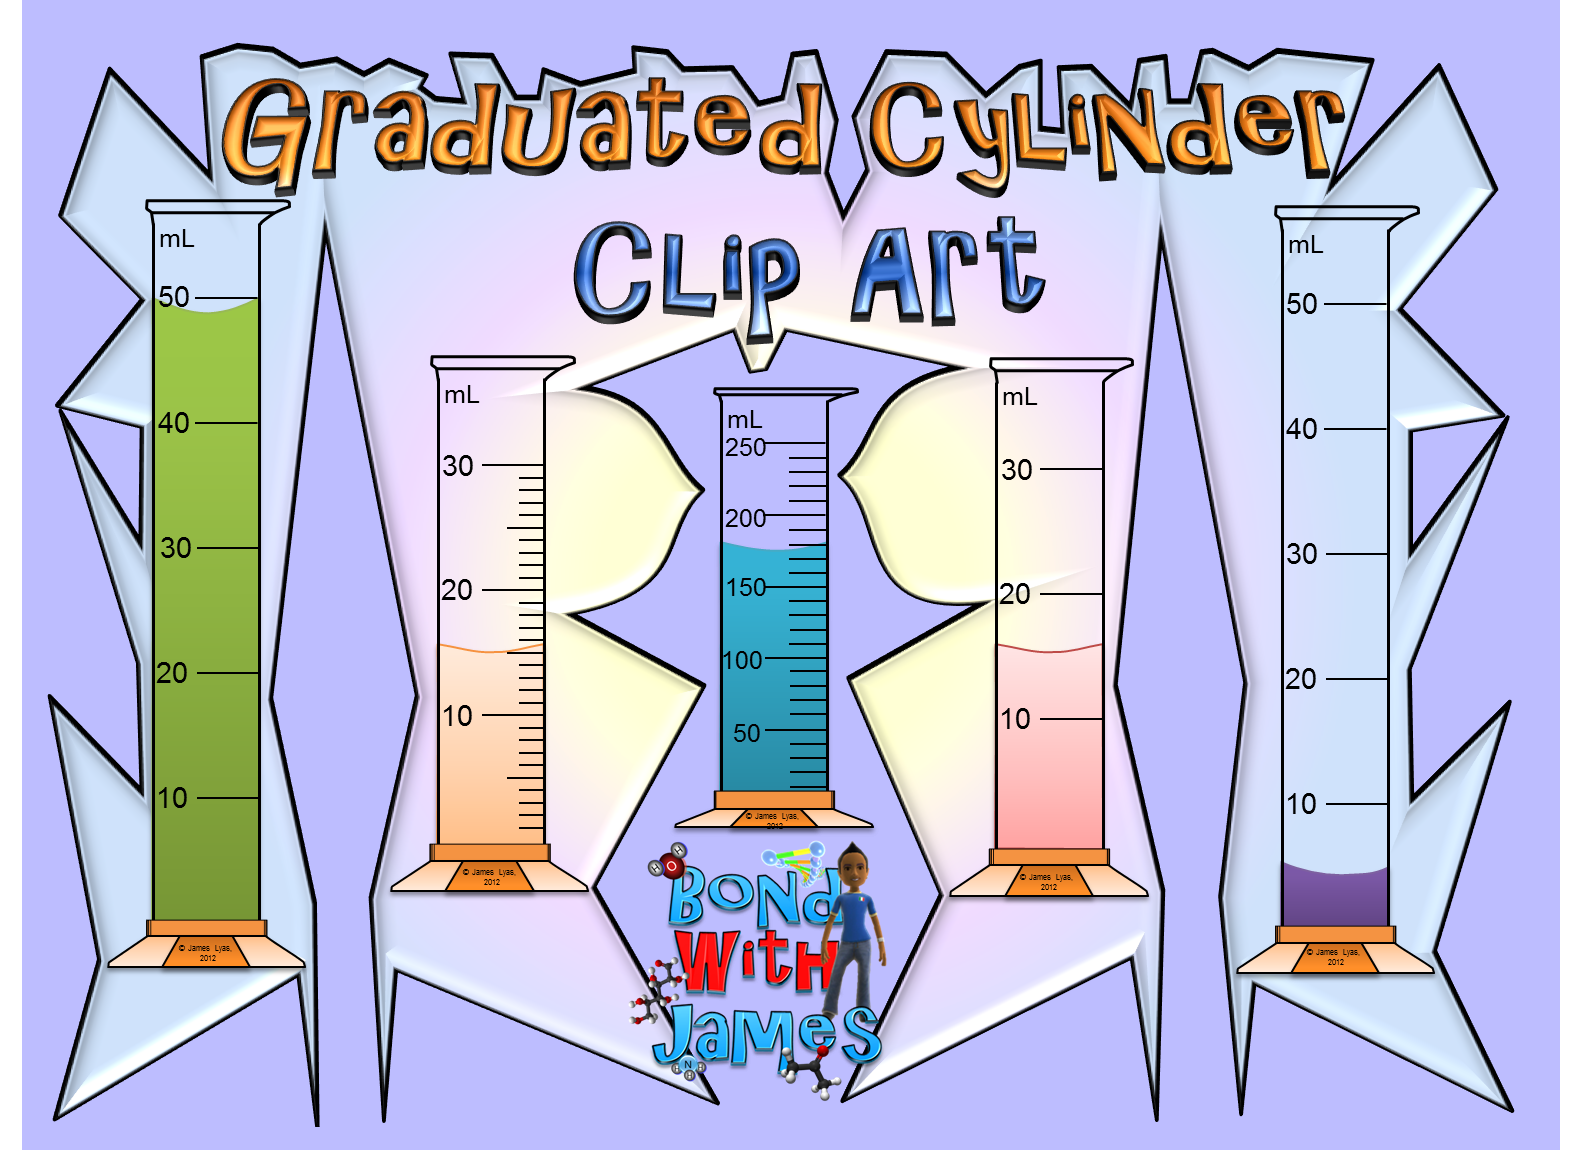 Graduated Cylinders Clip Art